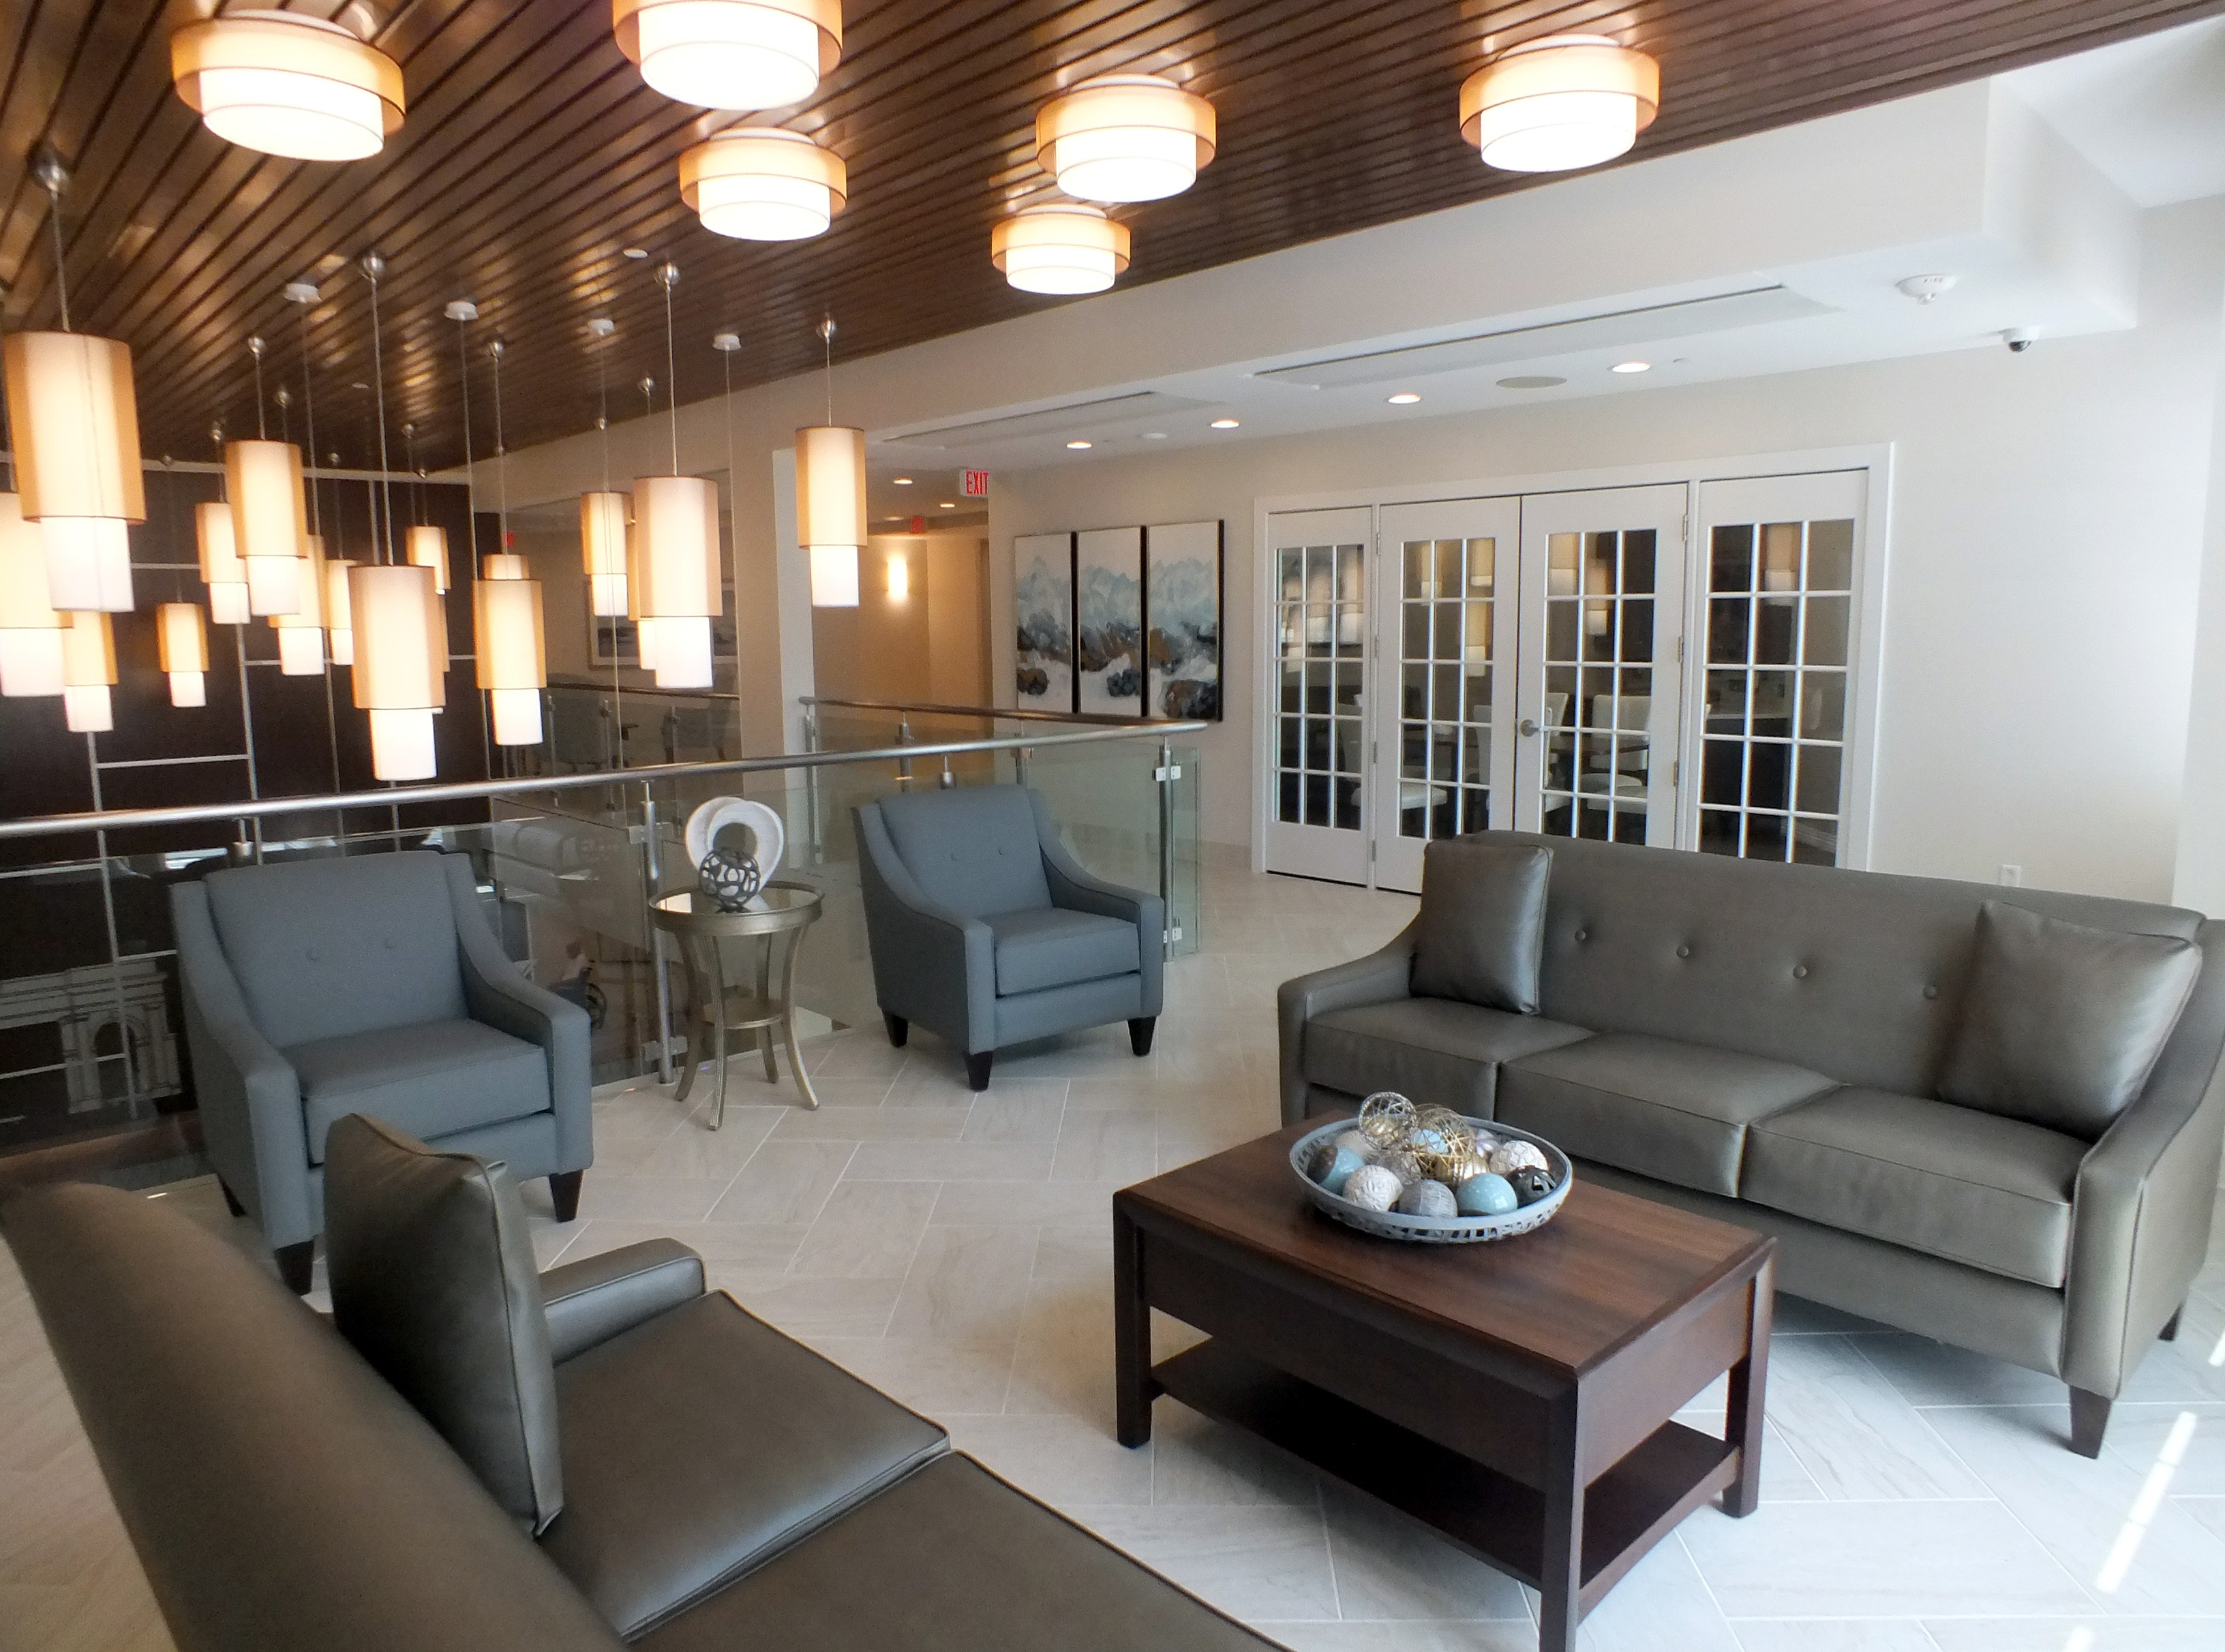 SNRC Lounge area 4